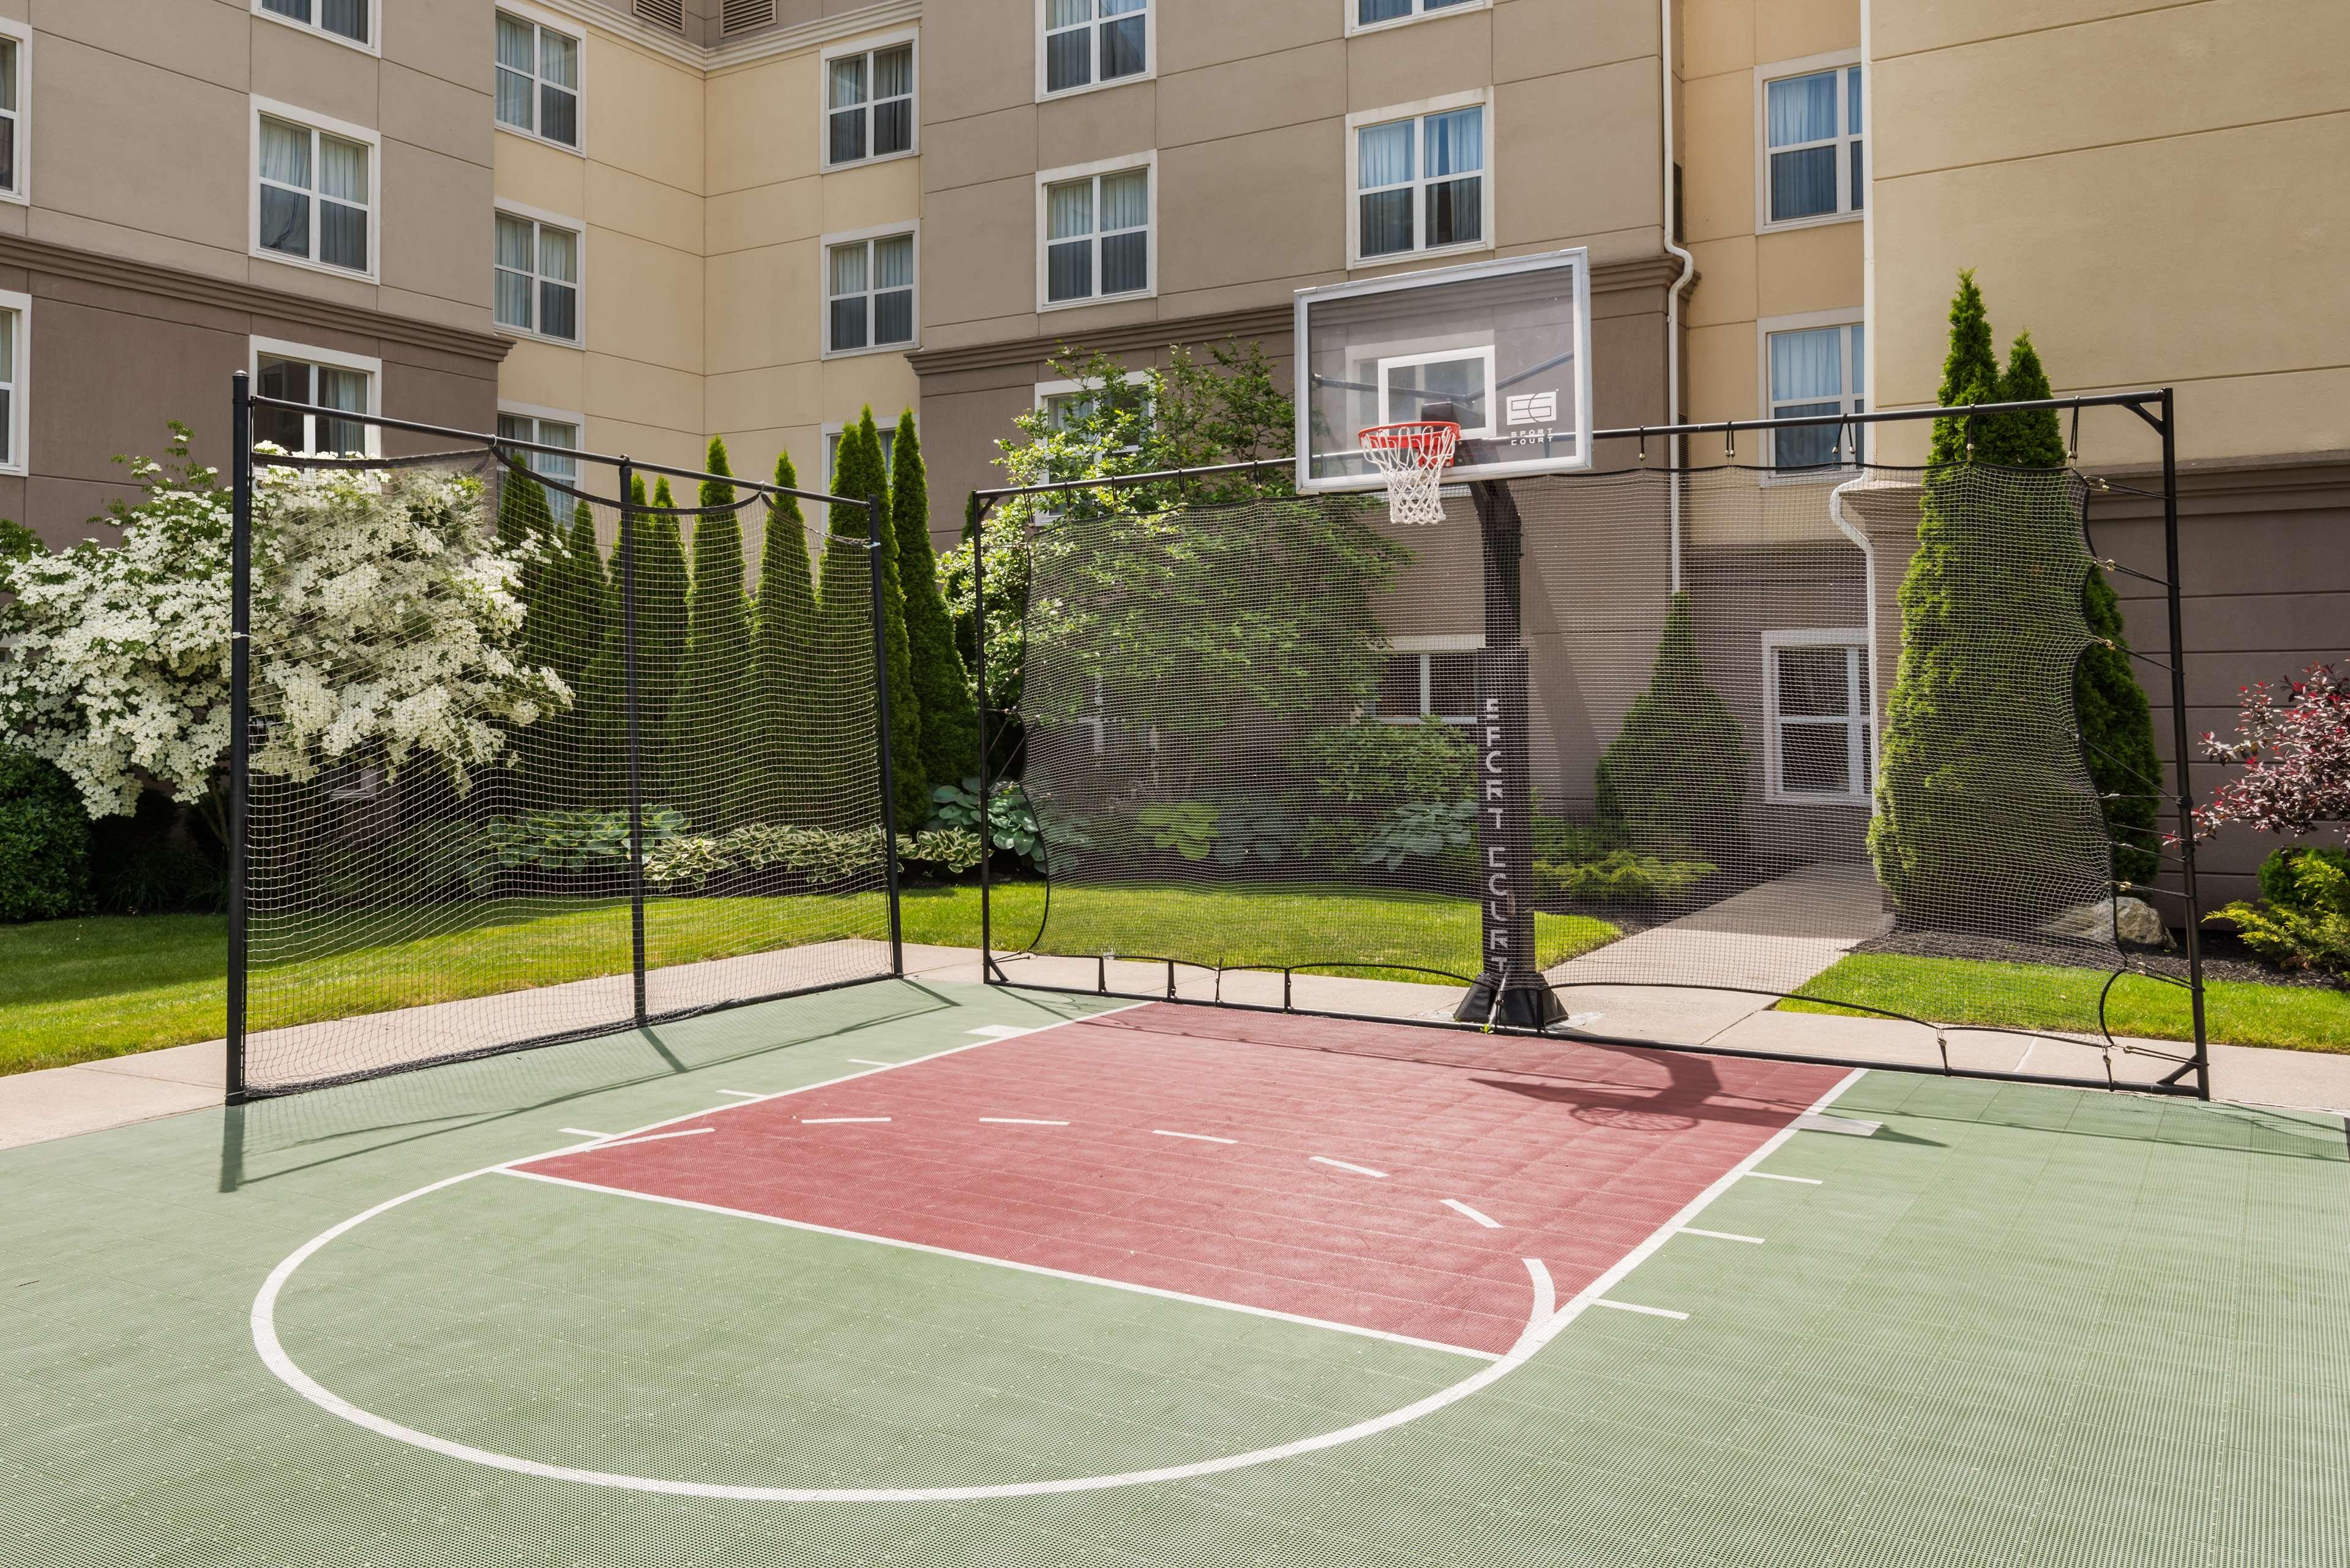 Homewood Suites by Hilton Holyoke-Springfield/North image 32